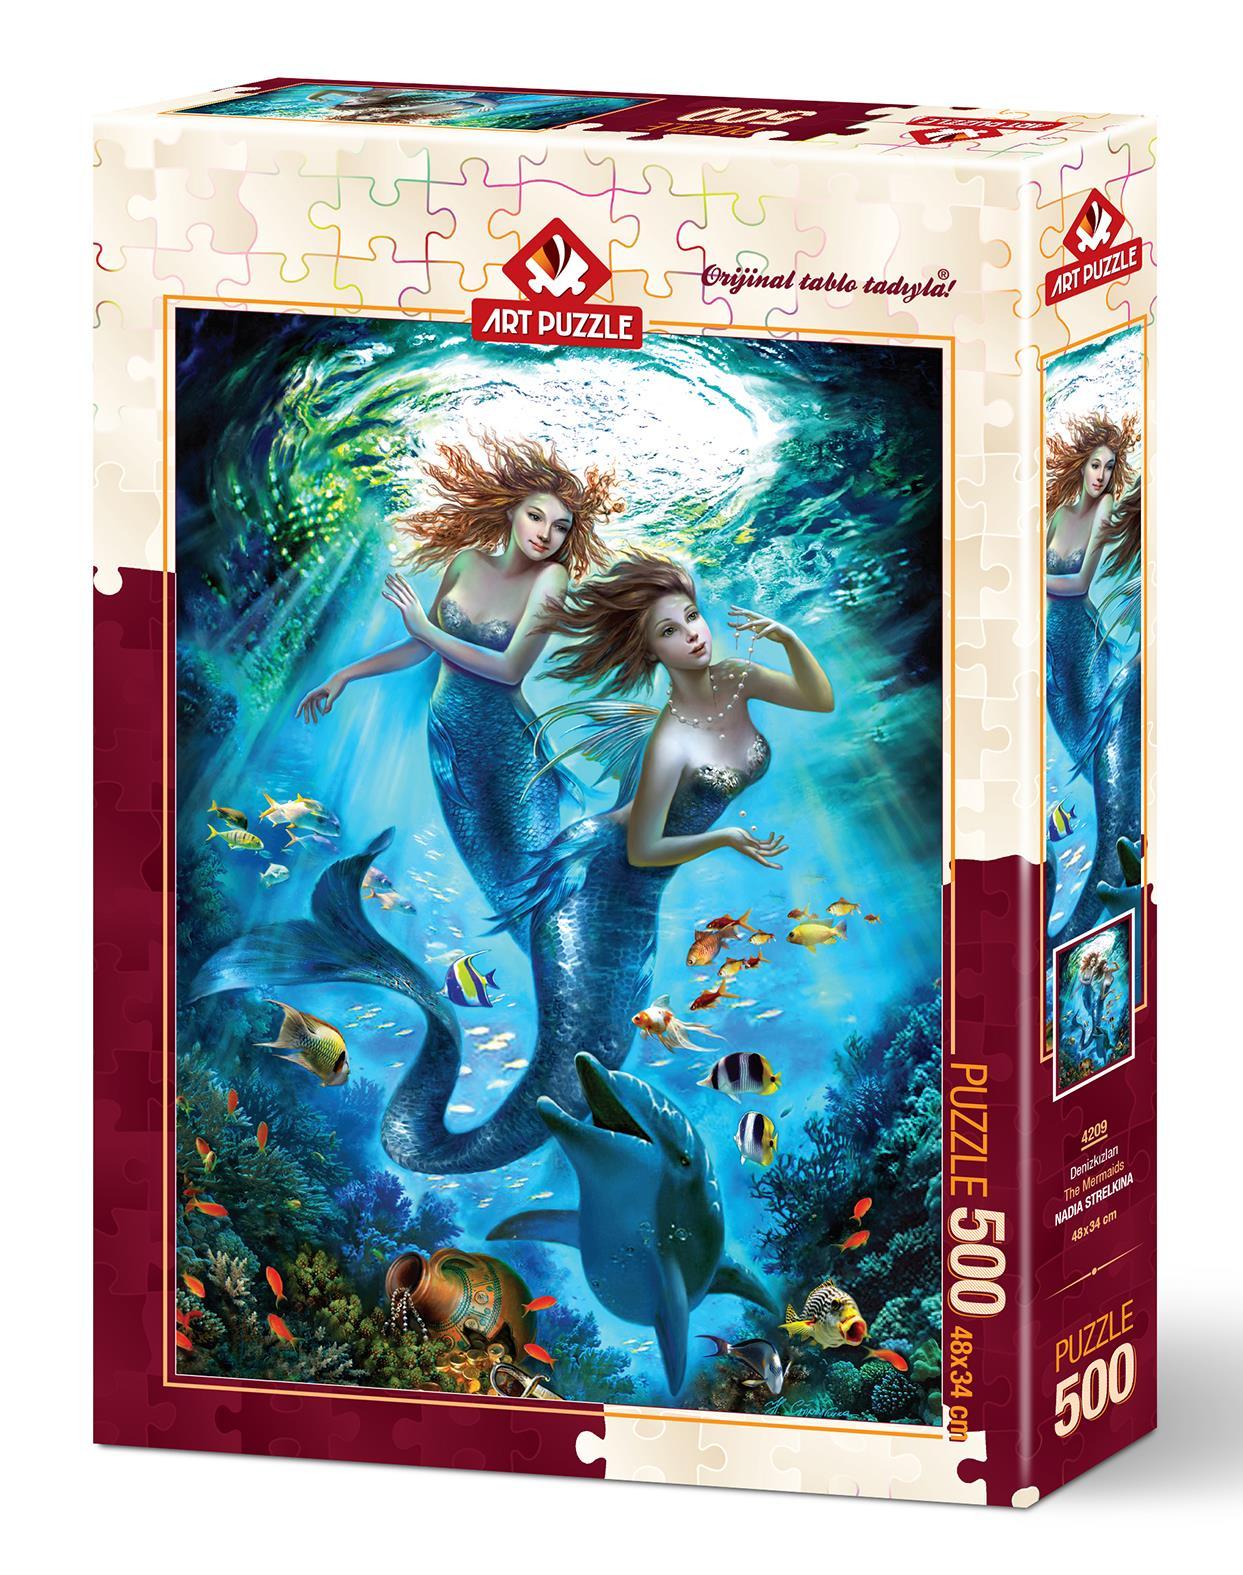 Art Puzzle 4209 Denizkızları 500 Parça Puzzle